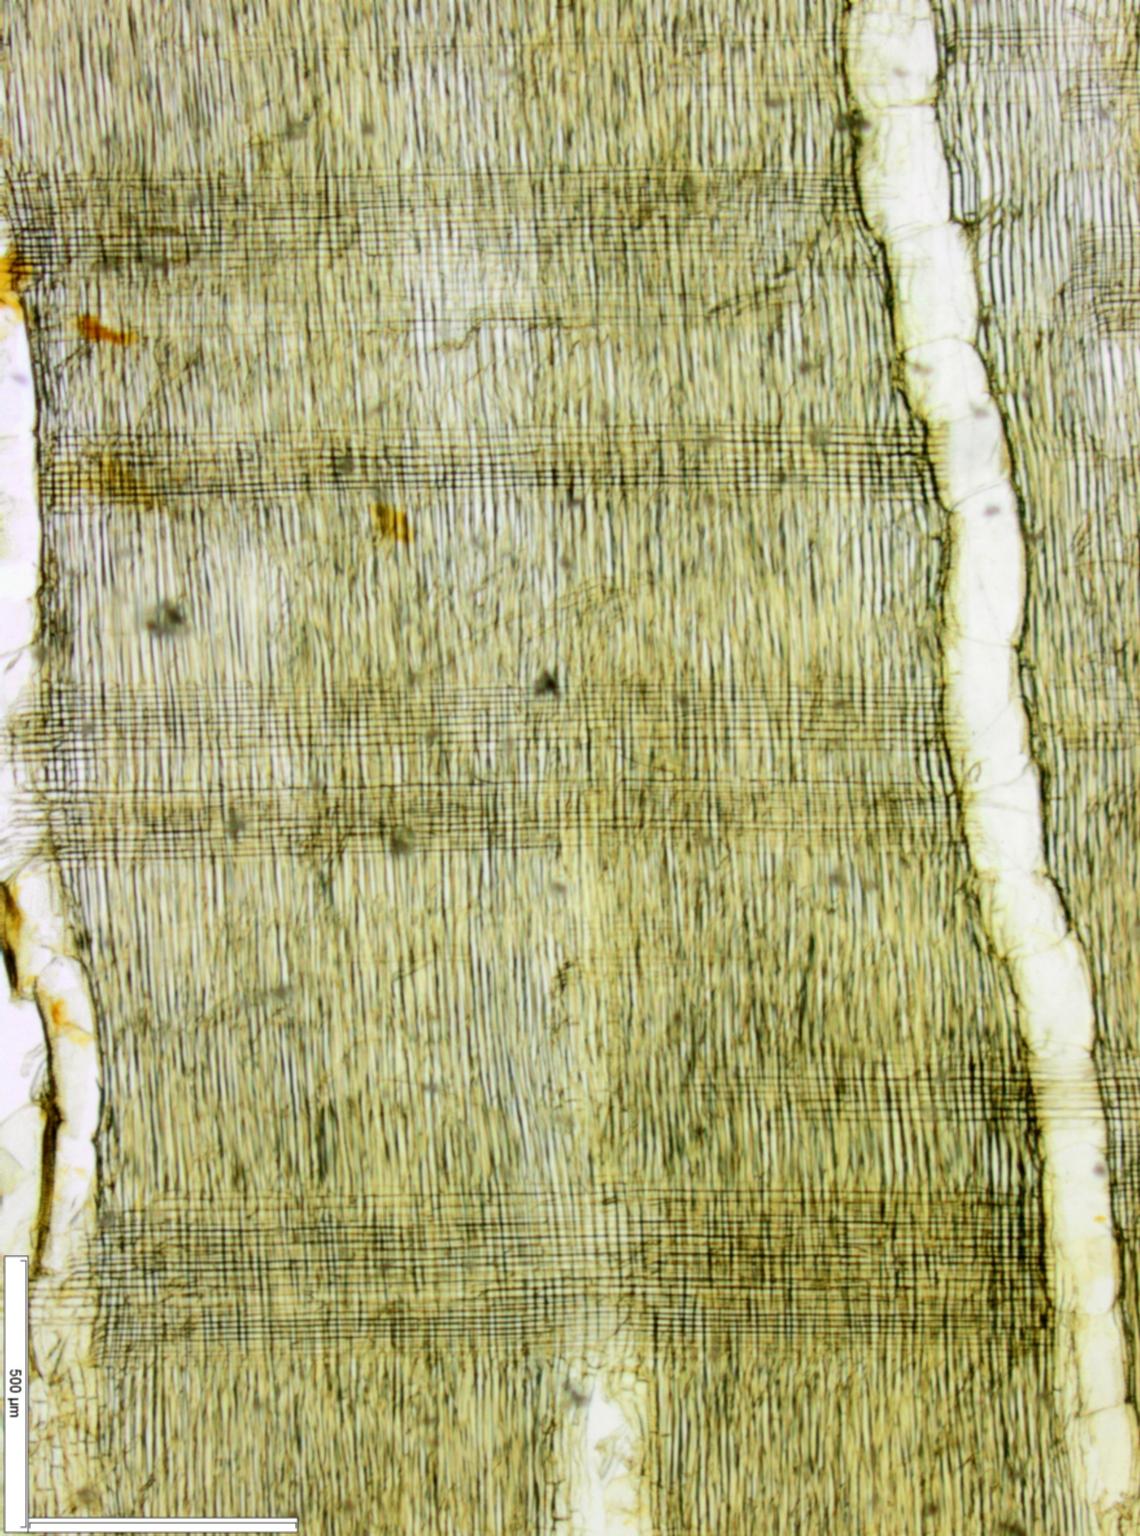 LEGUMINOSAE MIMOSOIDEAE Albizia antunesiana